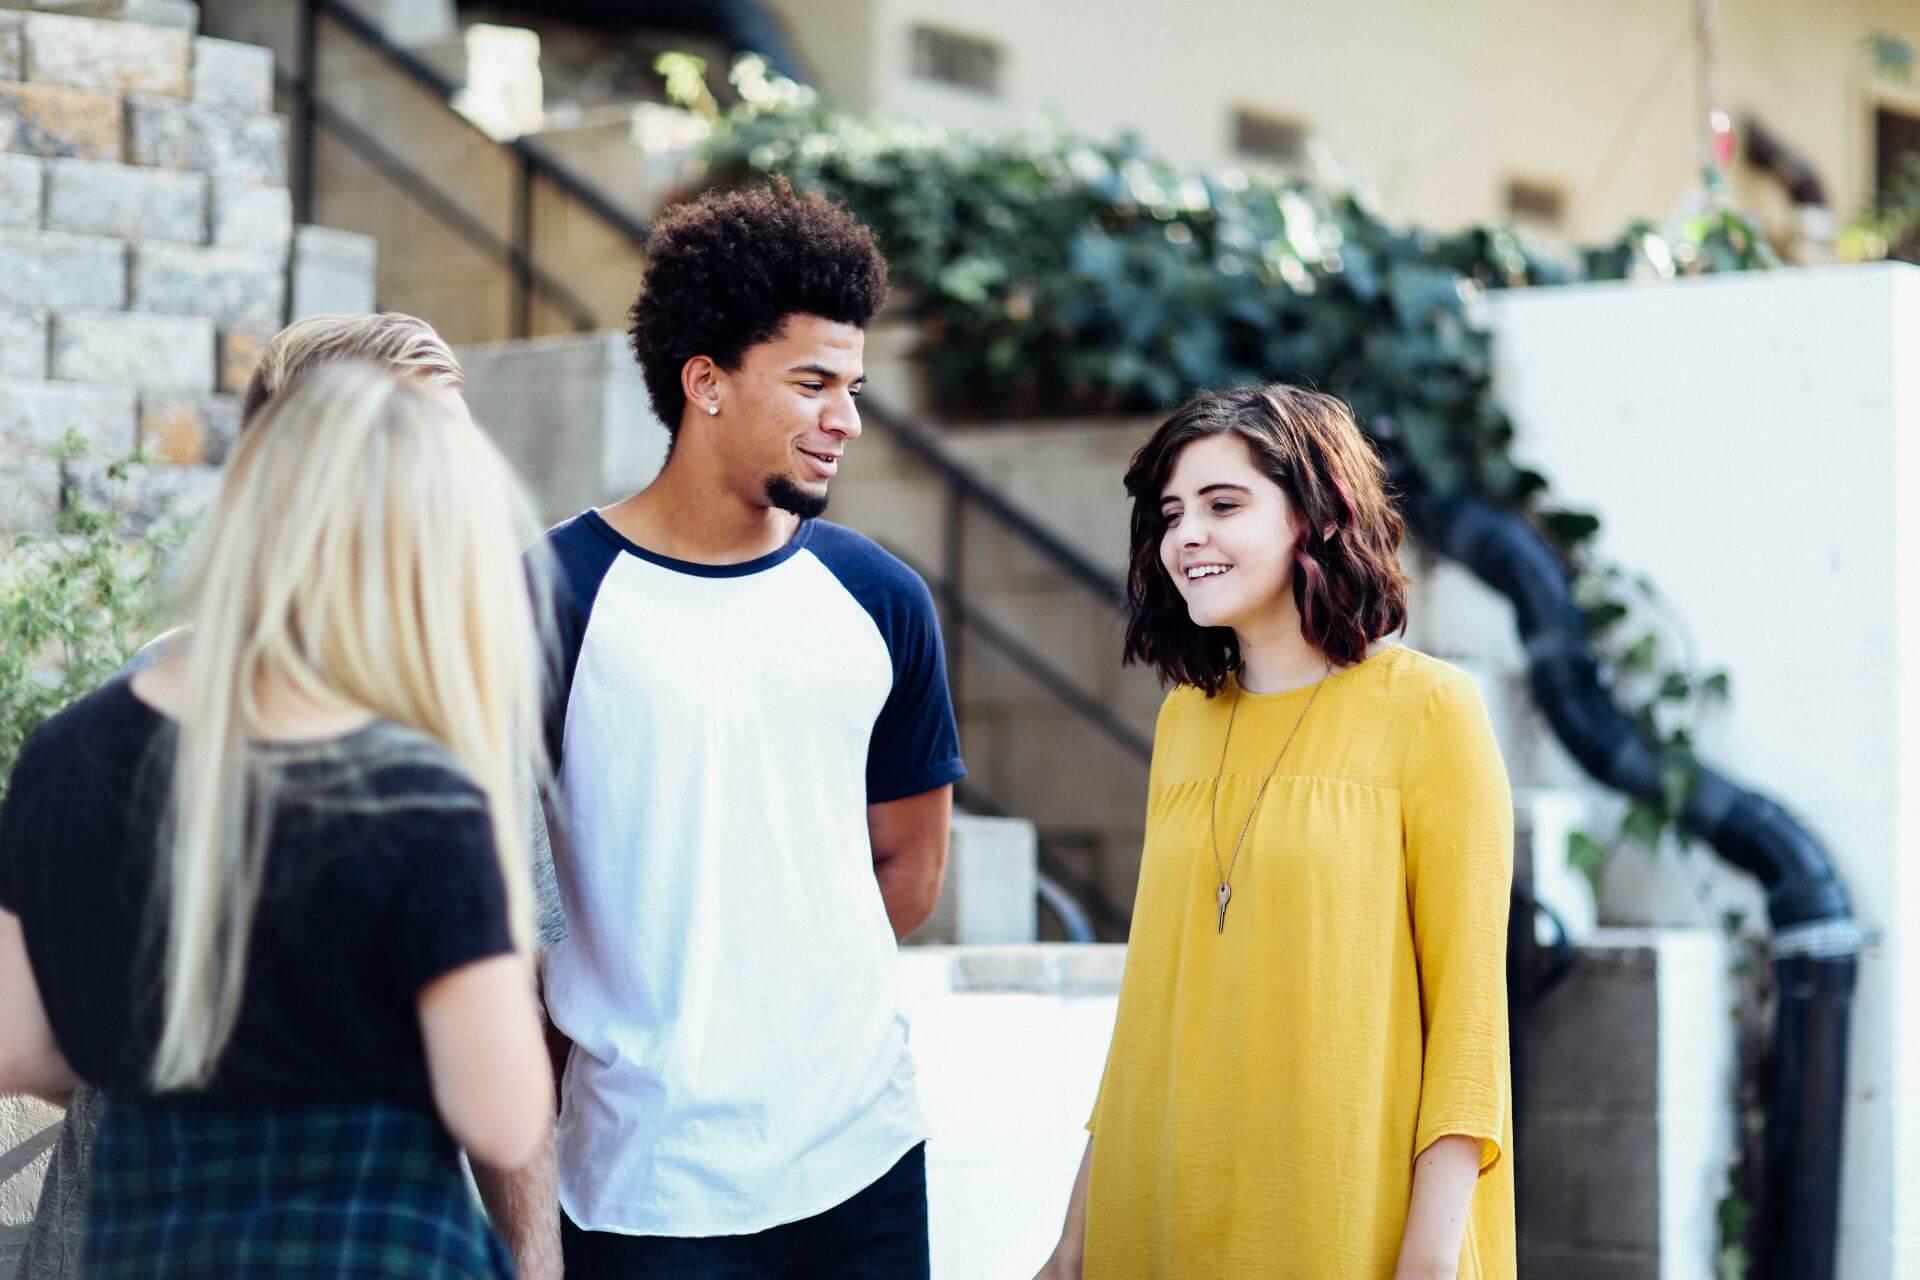 college kids talking  - alexis-brown-85793-unsplash